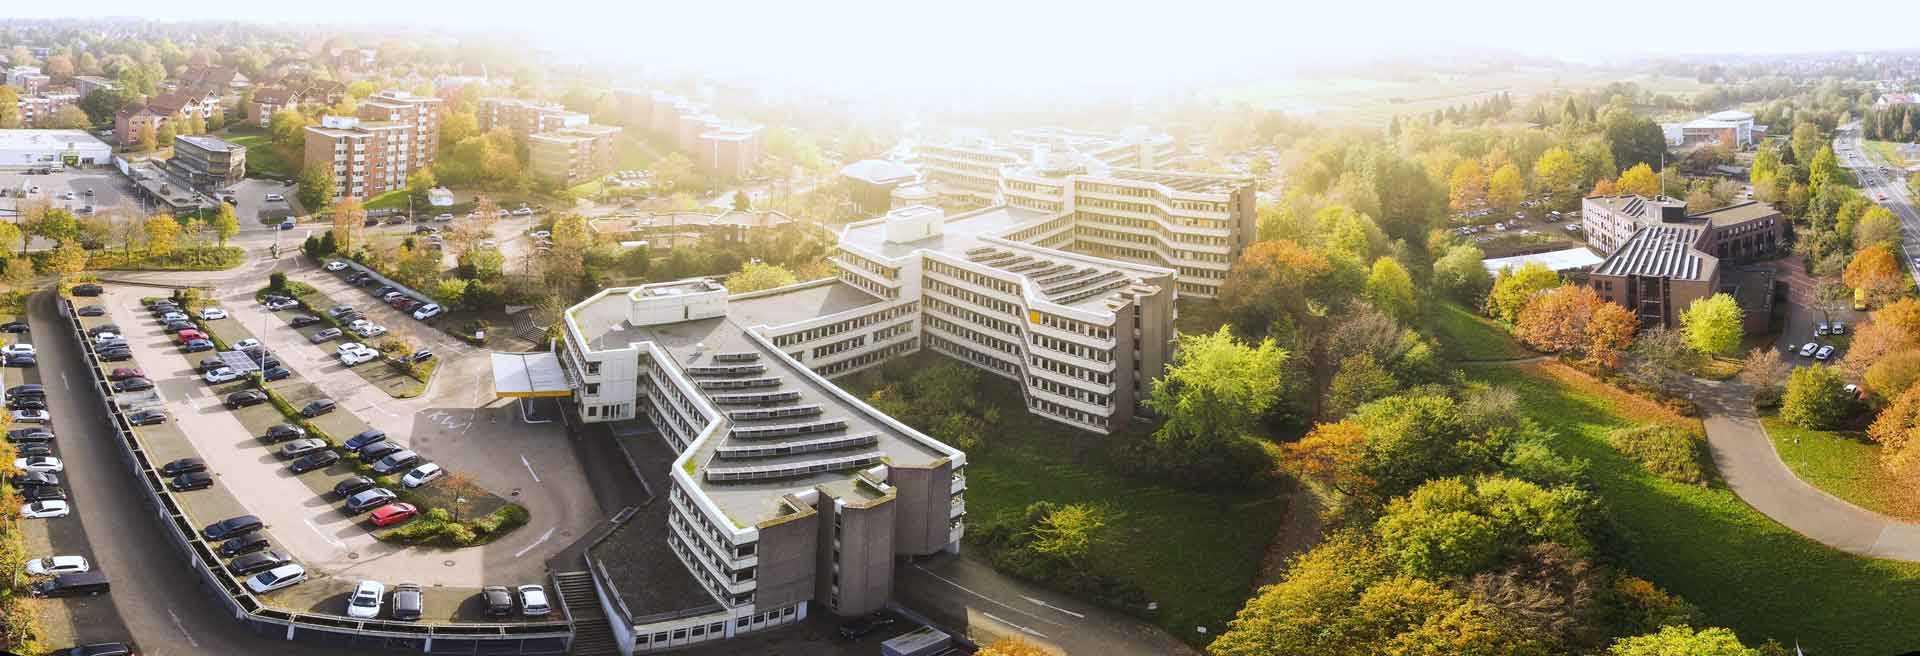 Kreis Lippe Storage-Infrastruktur